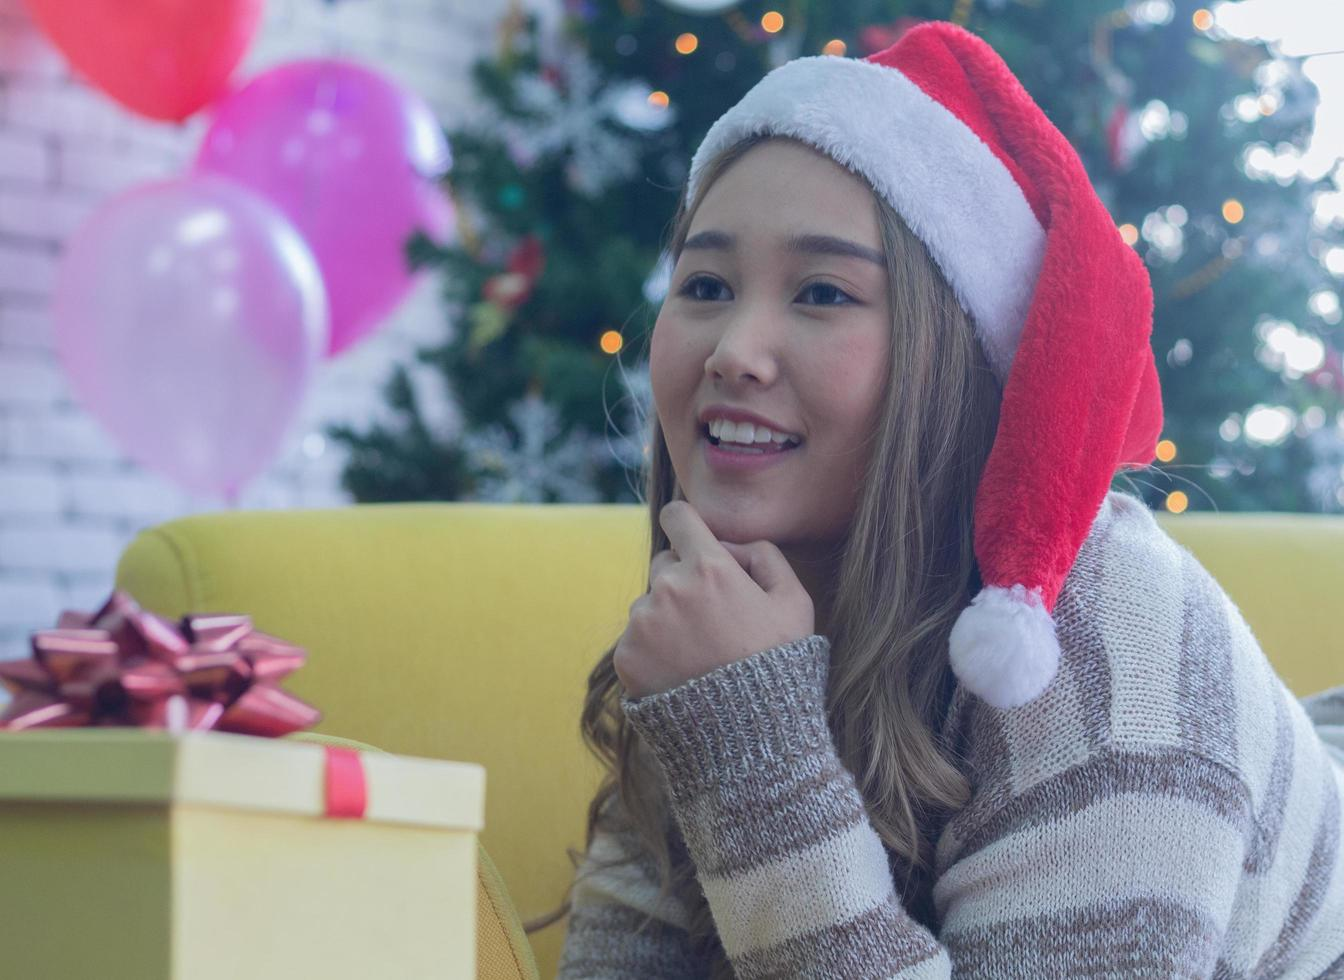 Woman with Christmas present photo